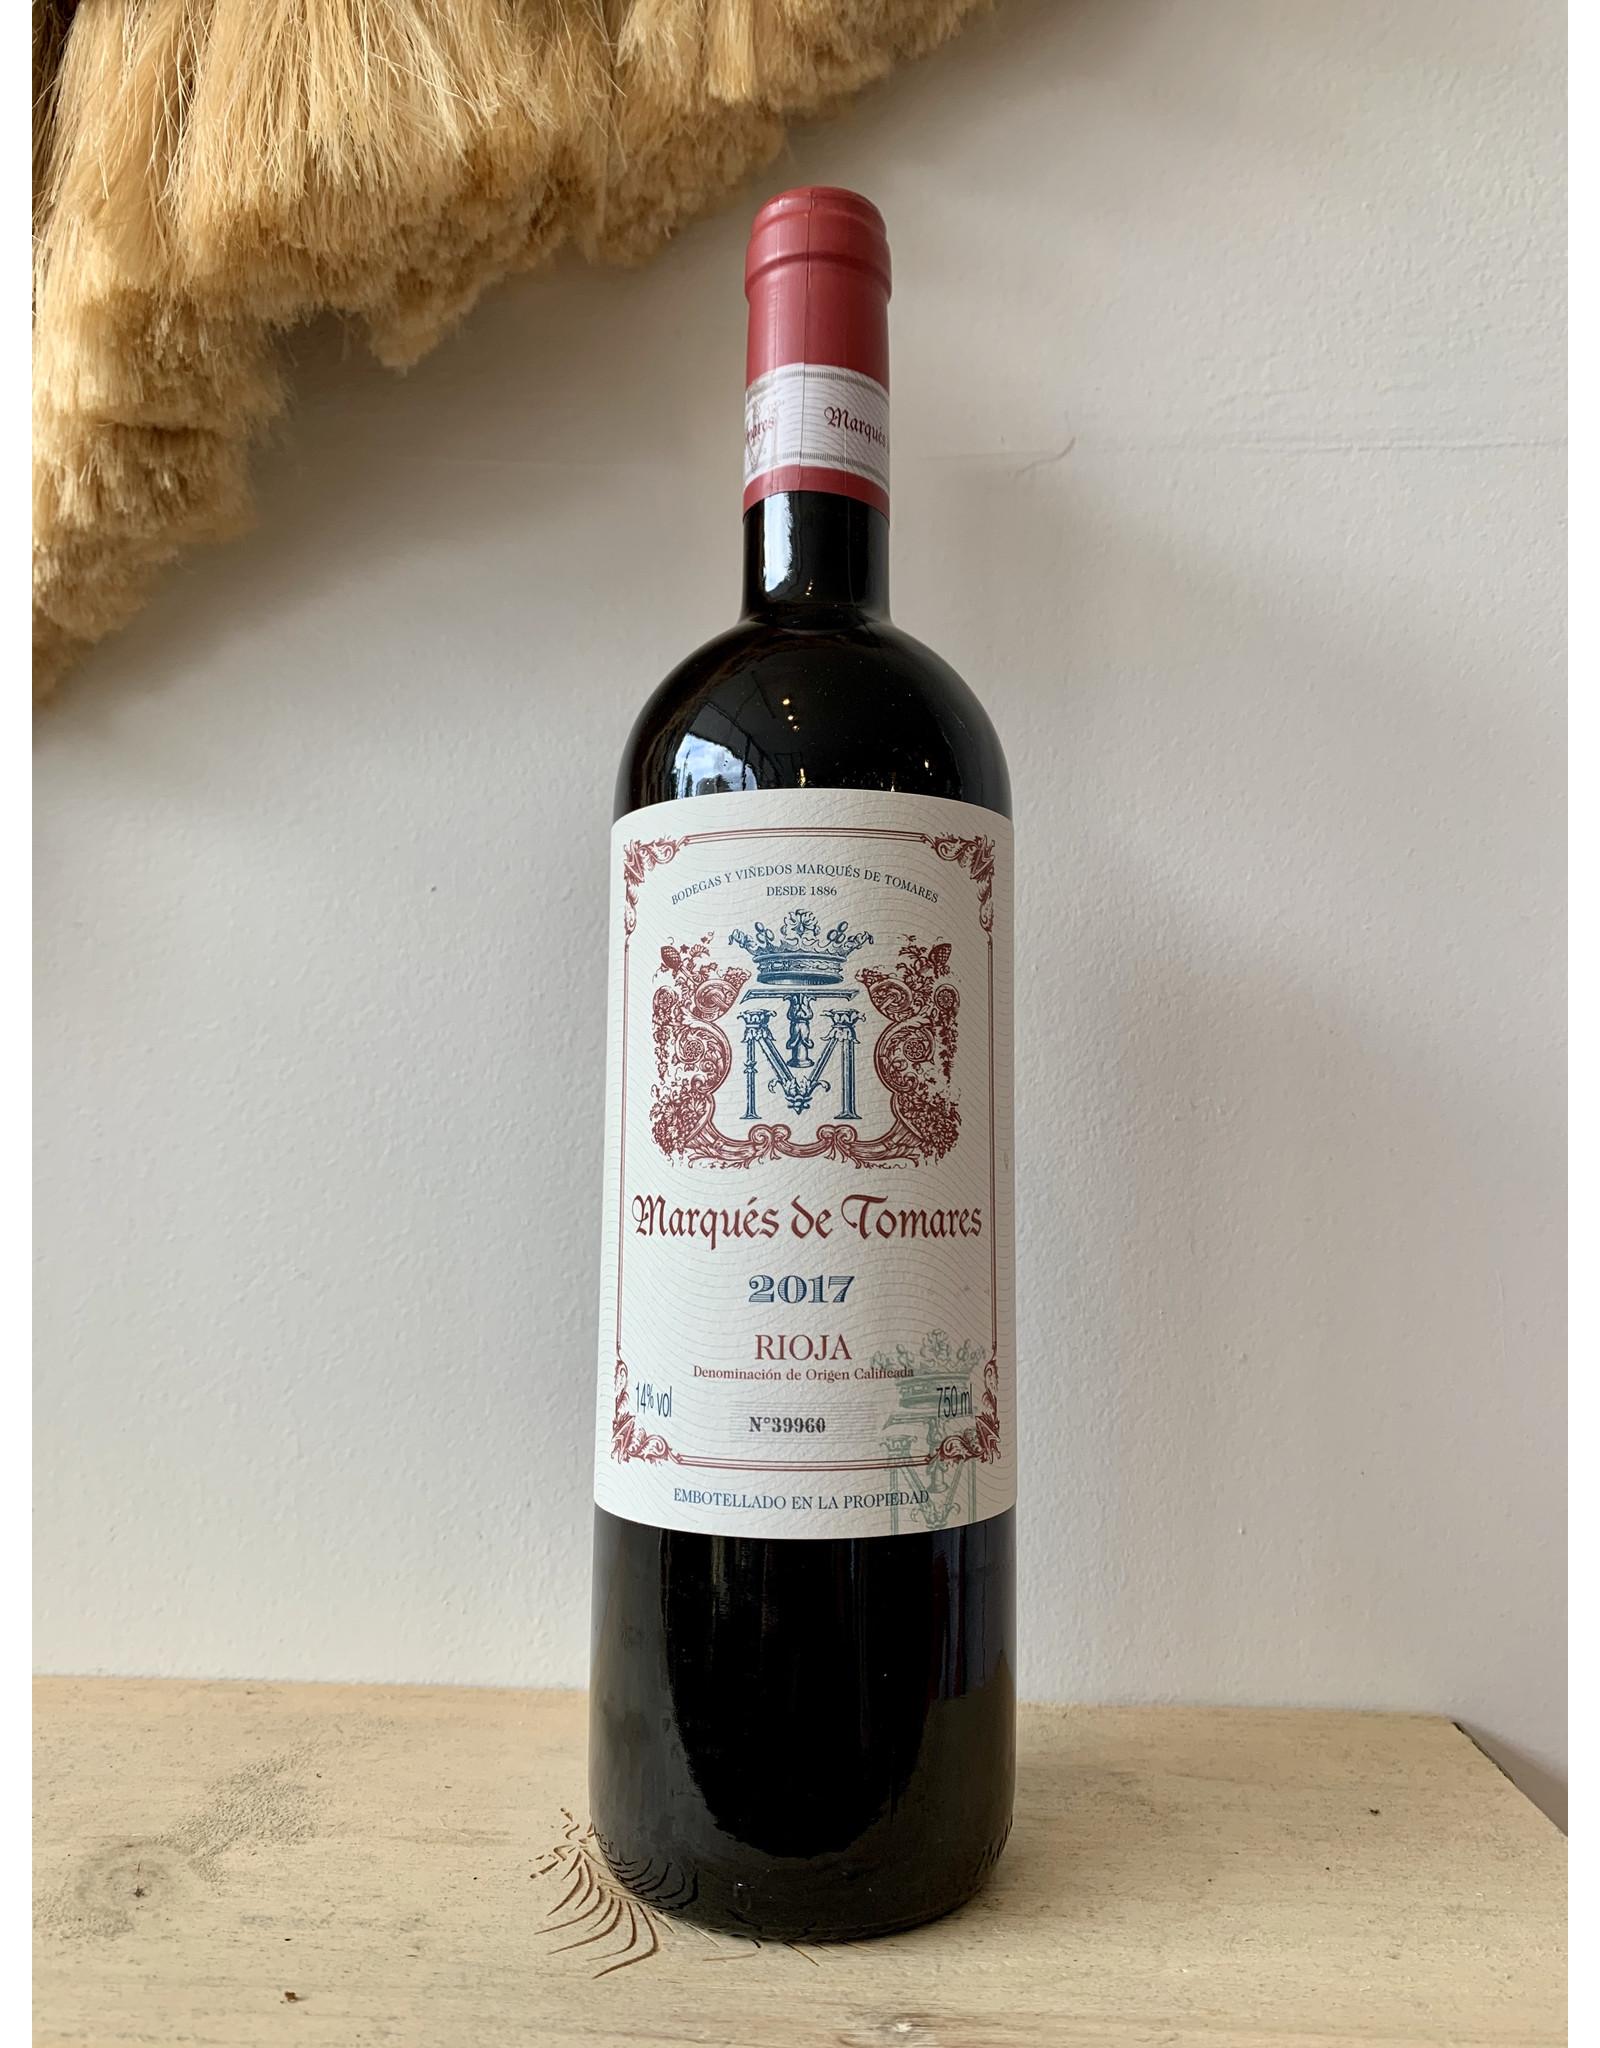 Marques de Tomares Rioja Crianza 2017